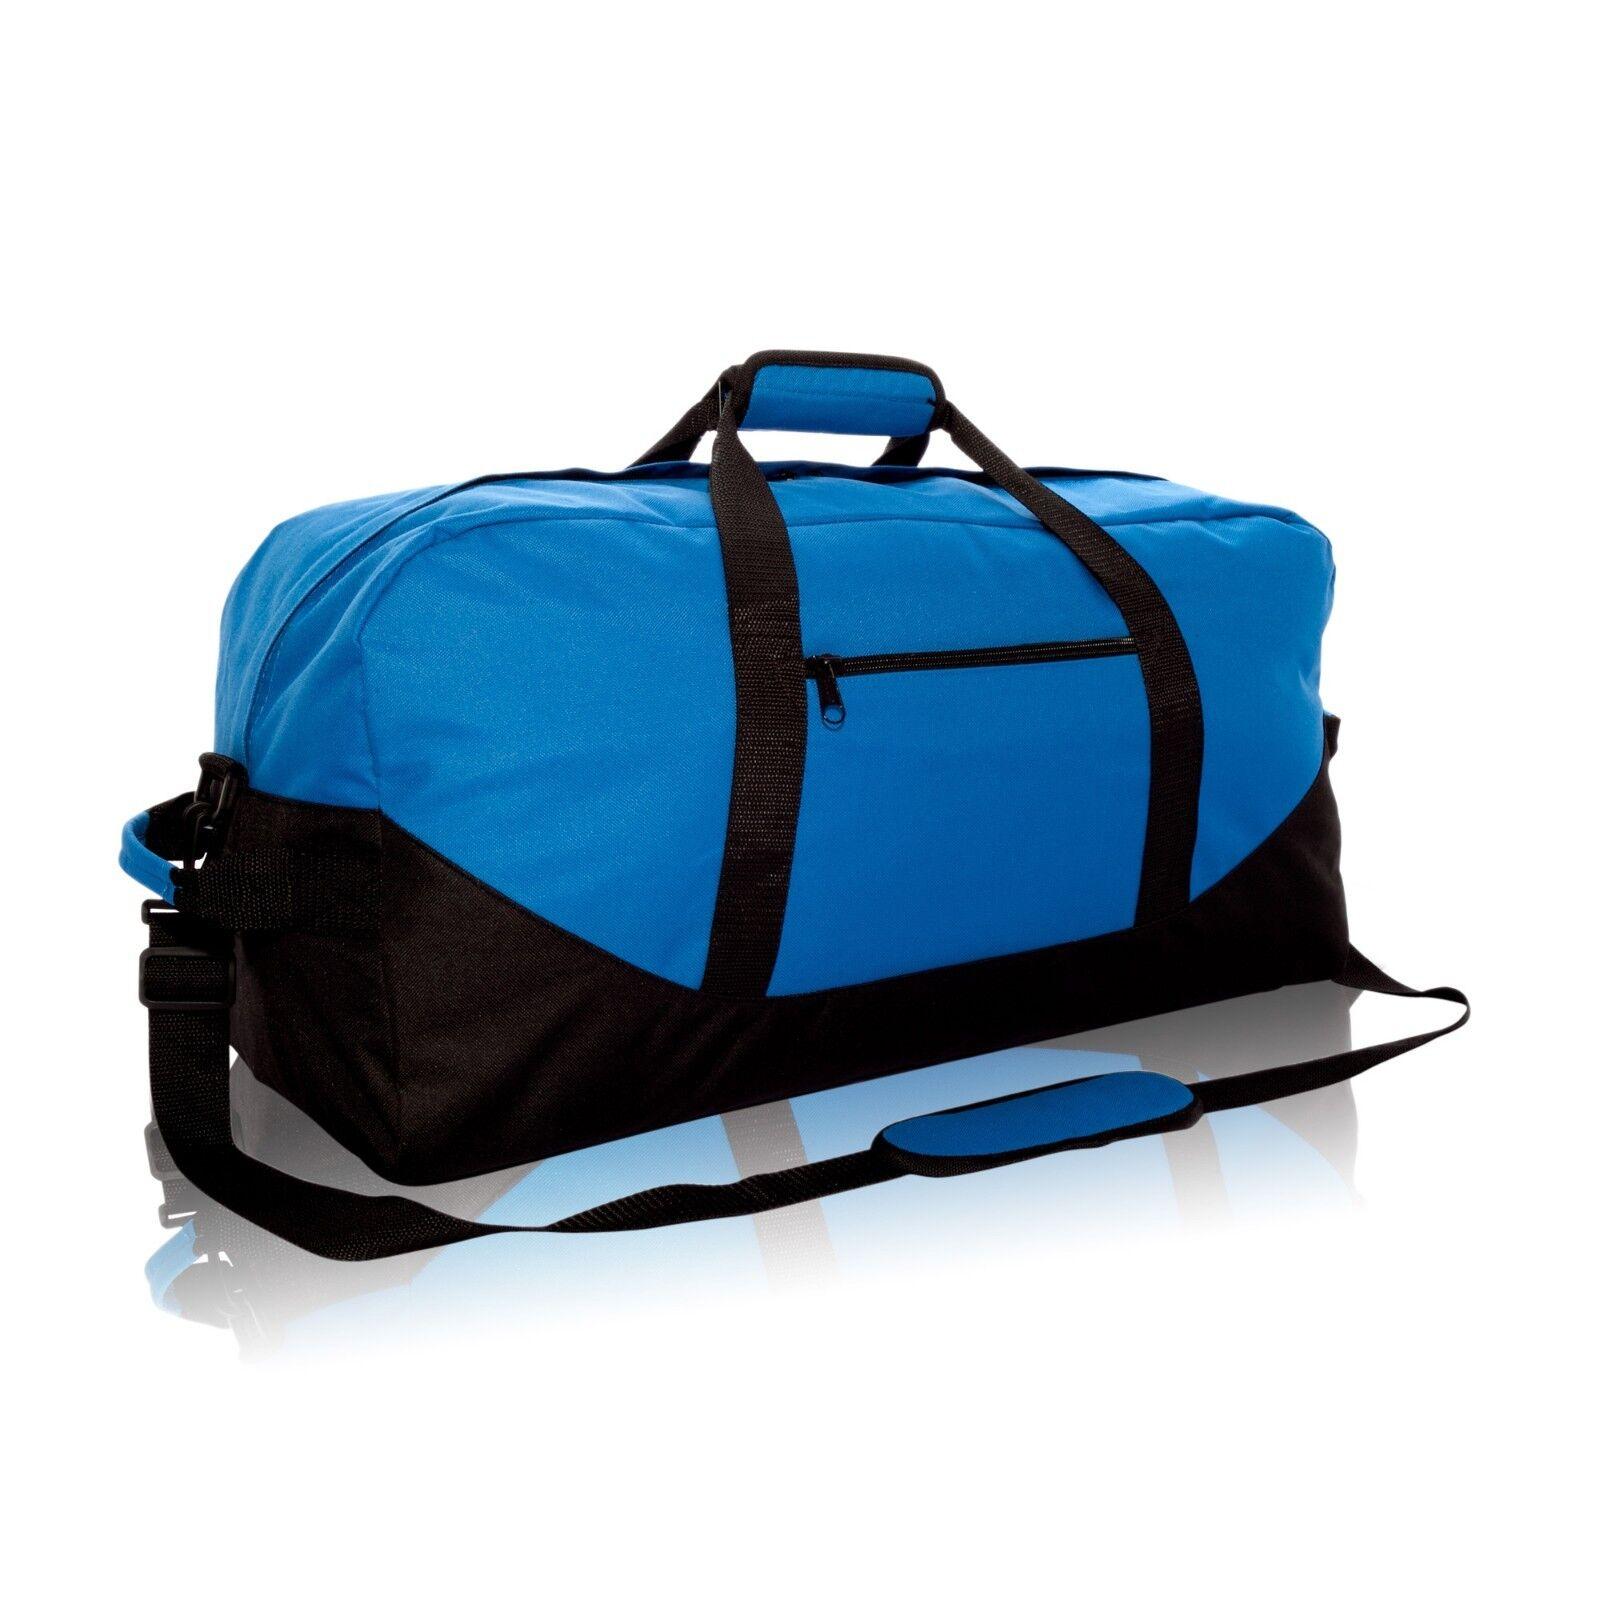 DALIX 25 Big Adventure Large Gym Sports Duffle Bags